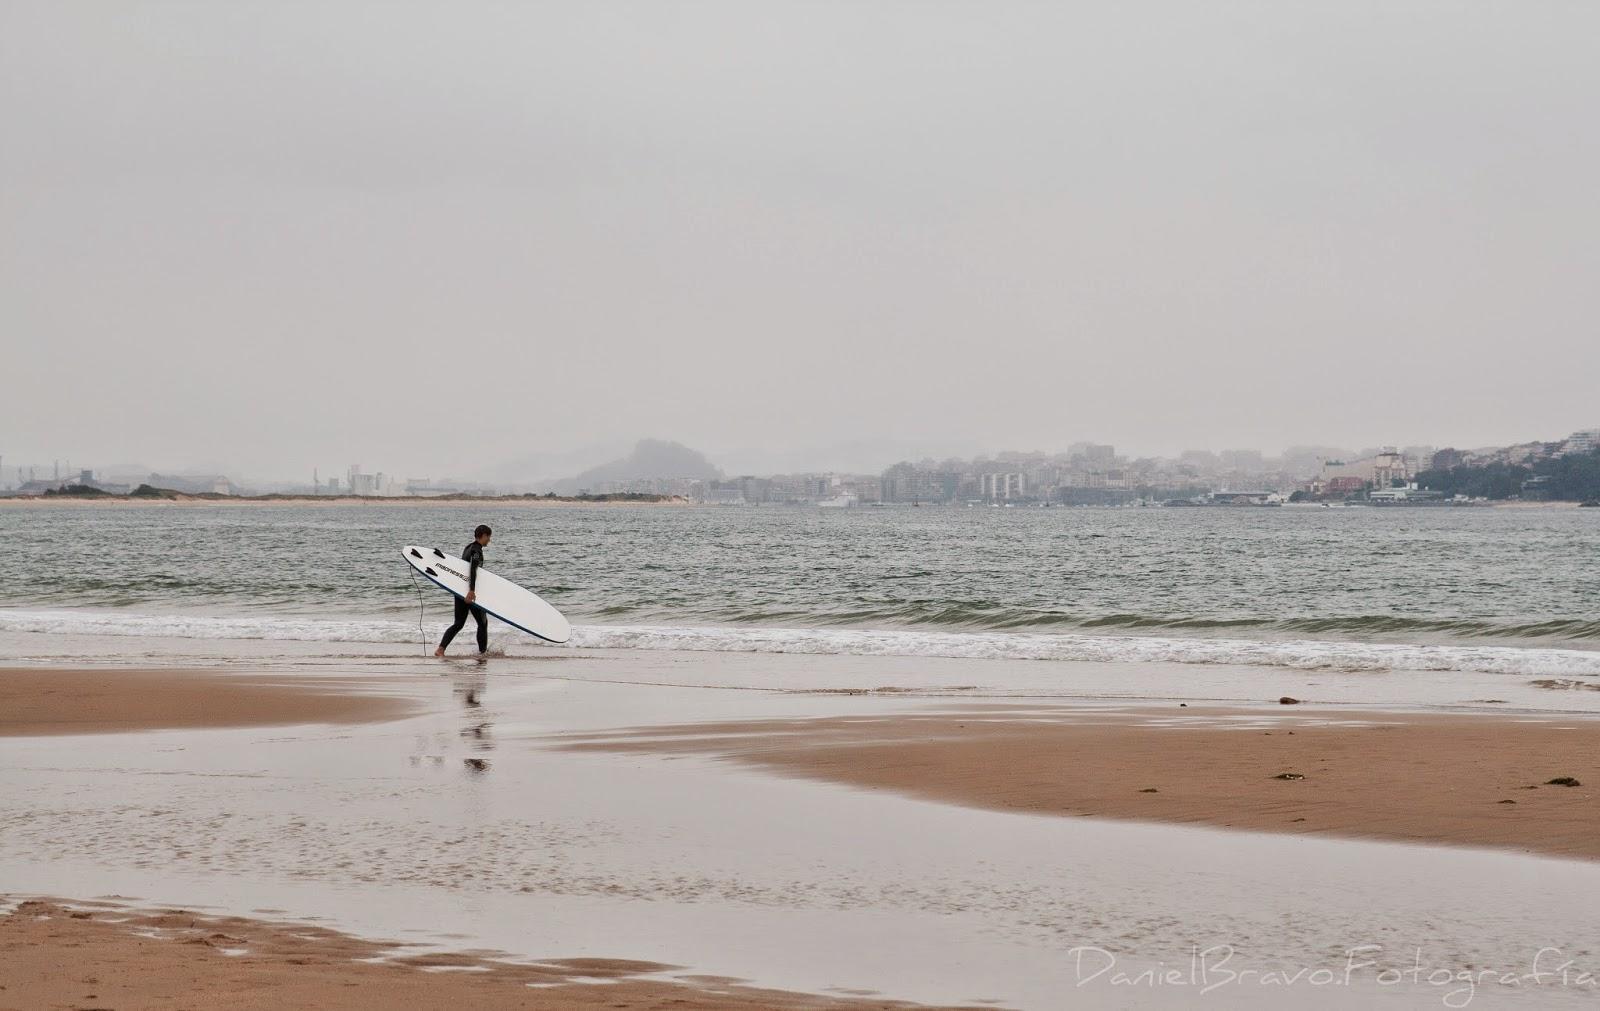 surf, surfero, playa, arena, playa, mar, olas, Loredo, Langre, Somo, Cantabria, Santander